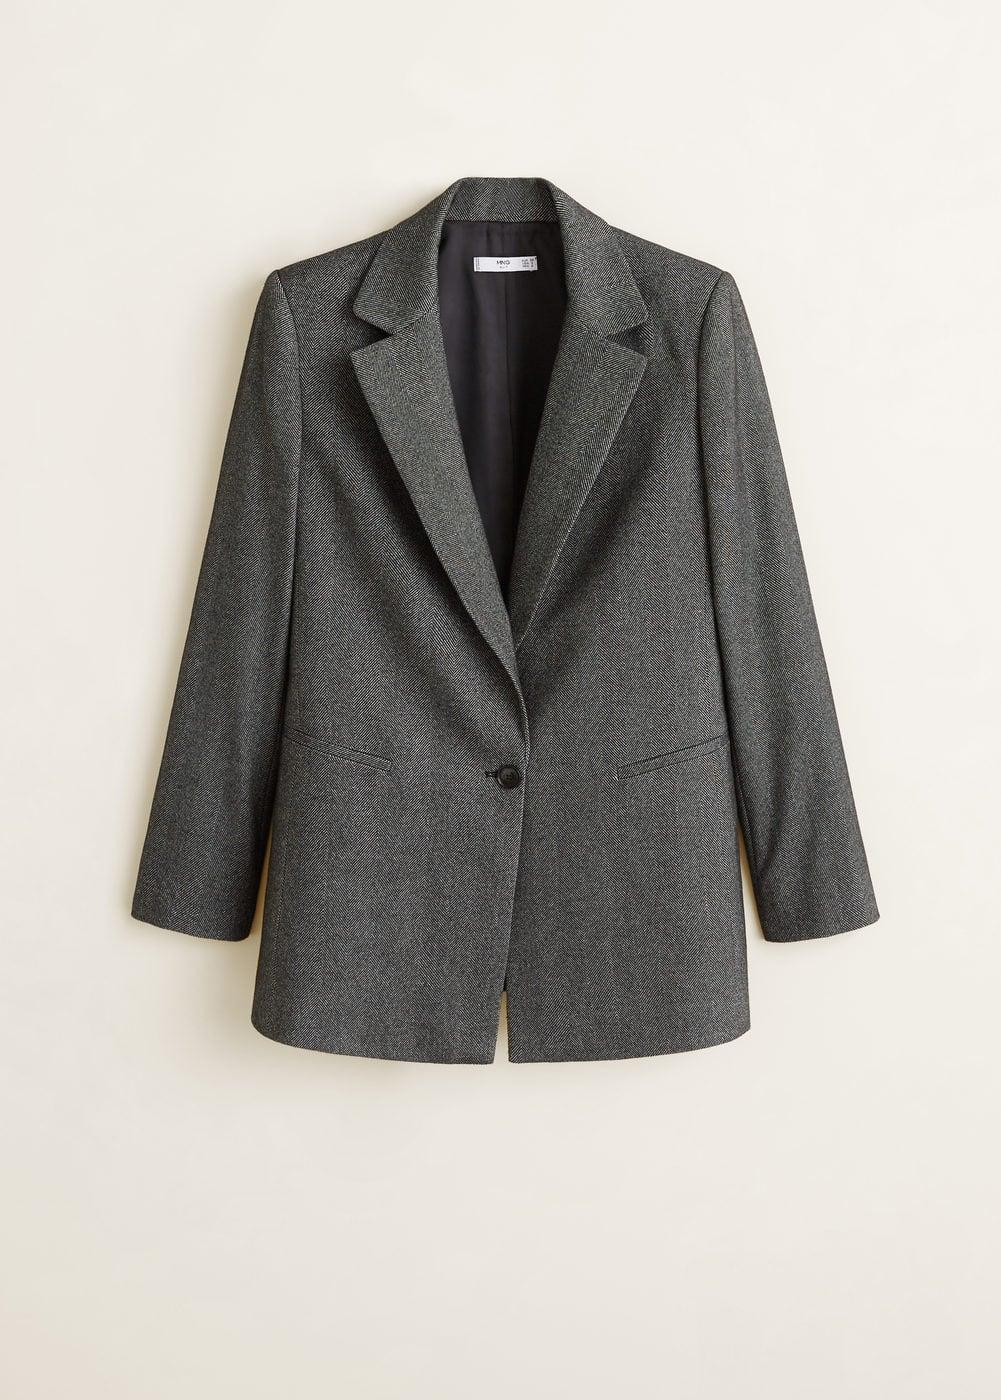 Mango - Flecked suit blazer - 7